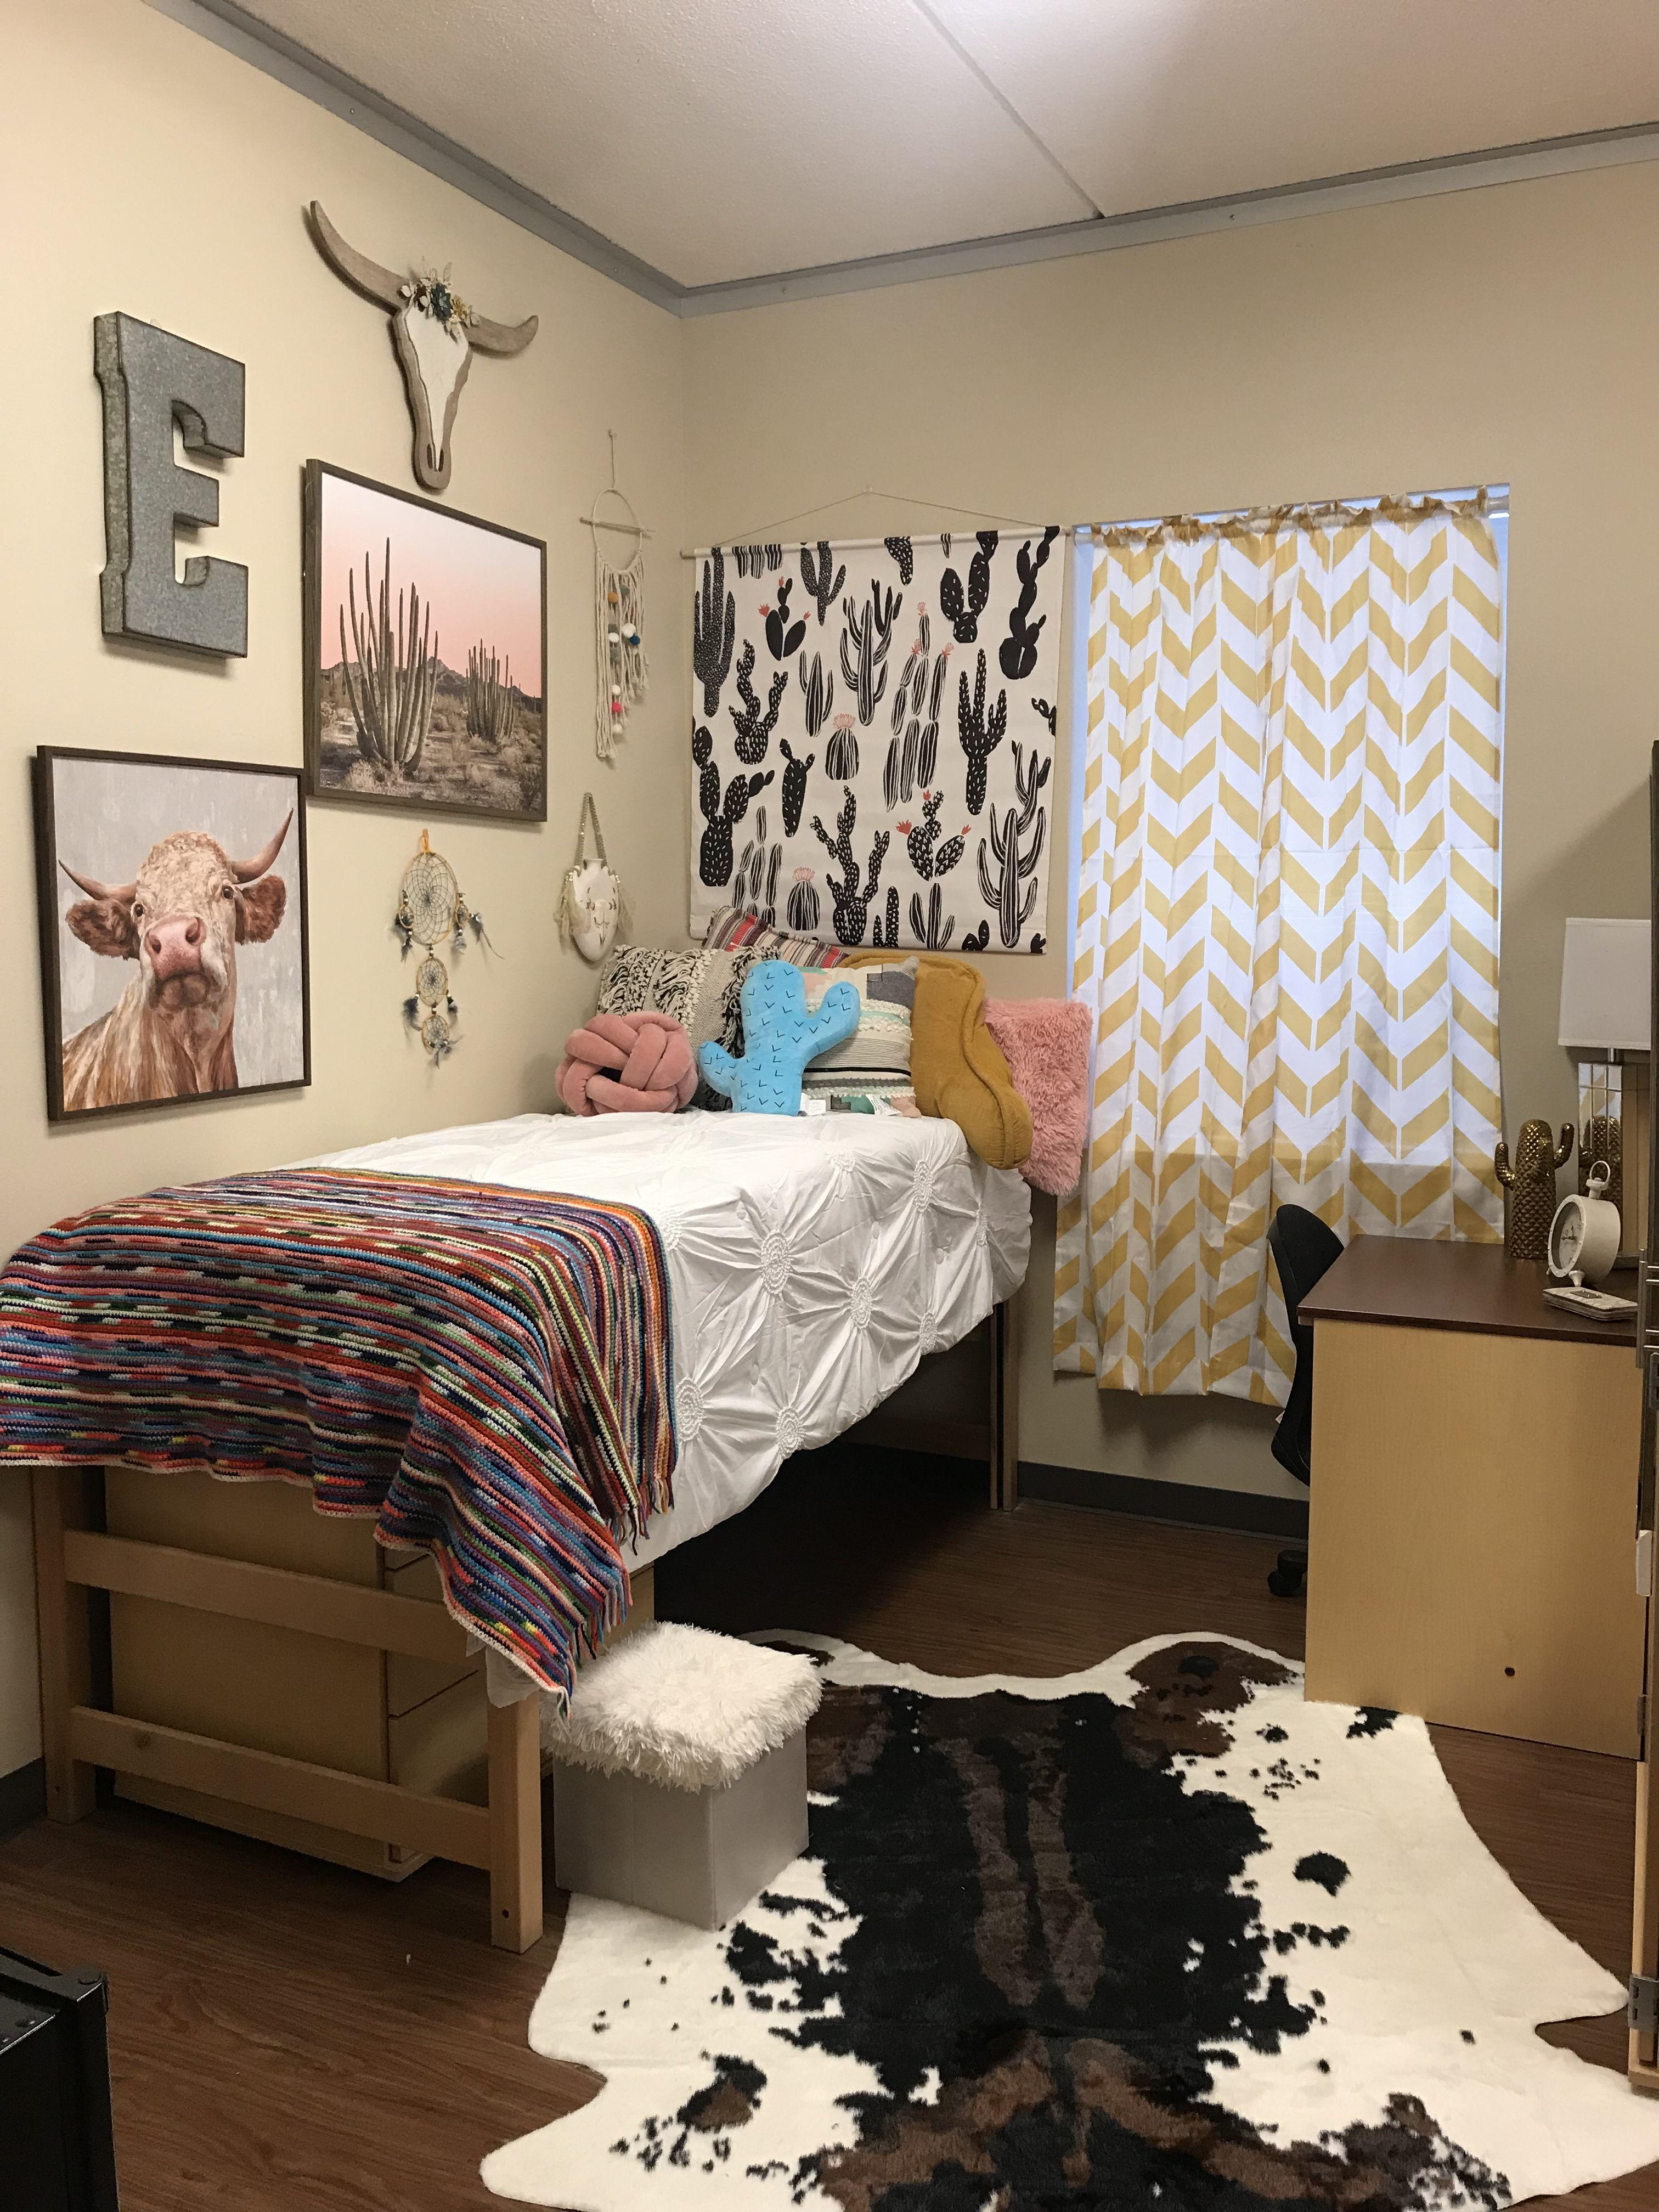 Dorm Western Cactus Cool Dorm Rooms Western Bedroom Decor Dorm Room Decor